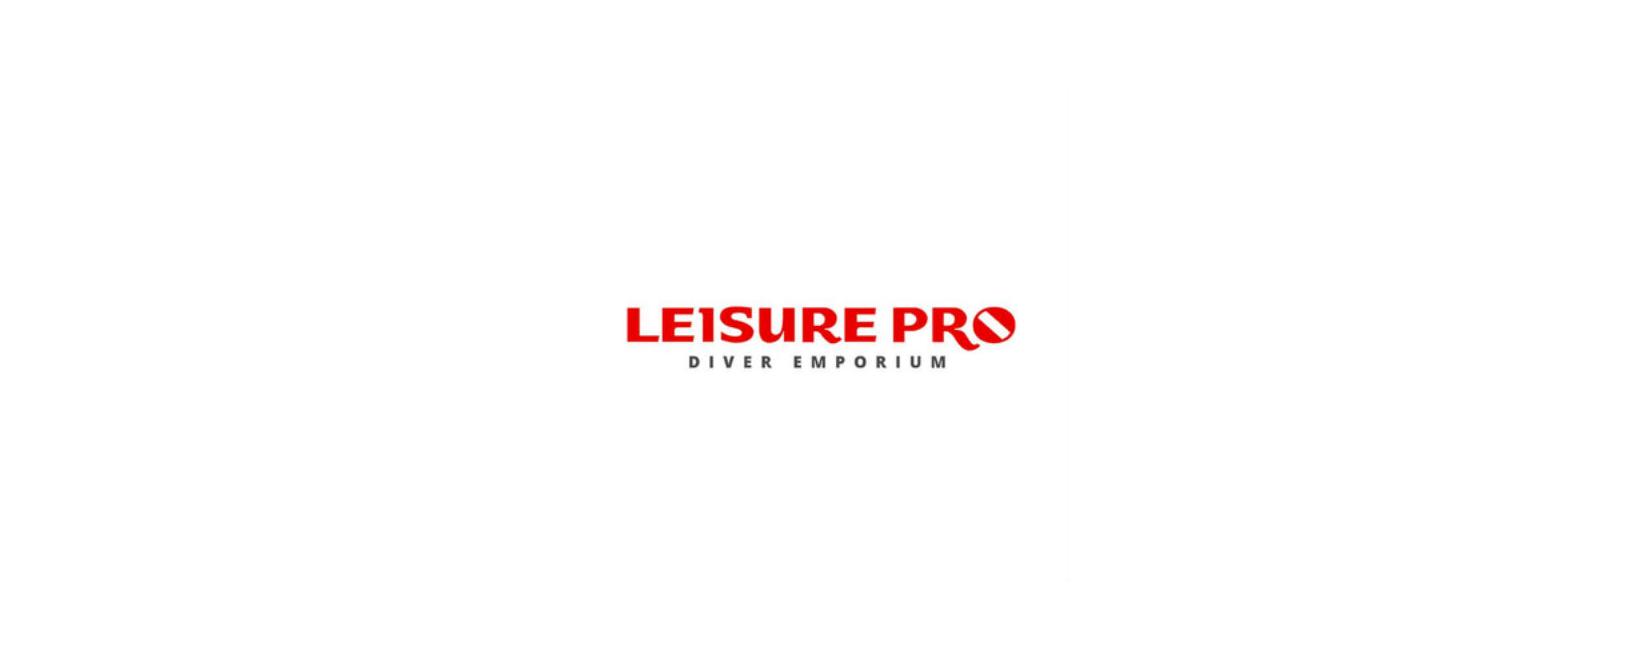 LeisurePro Coupon Code 2021